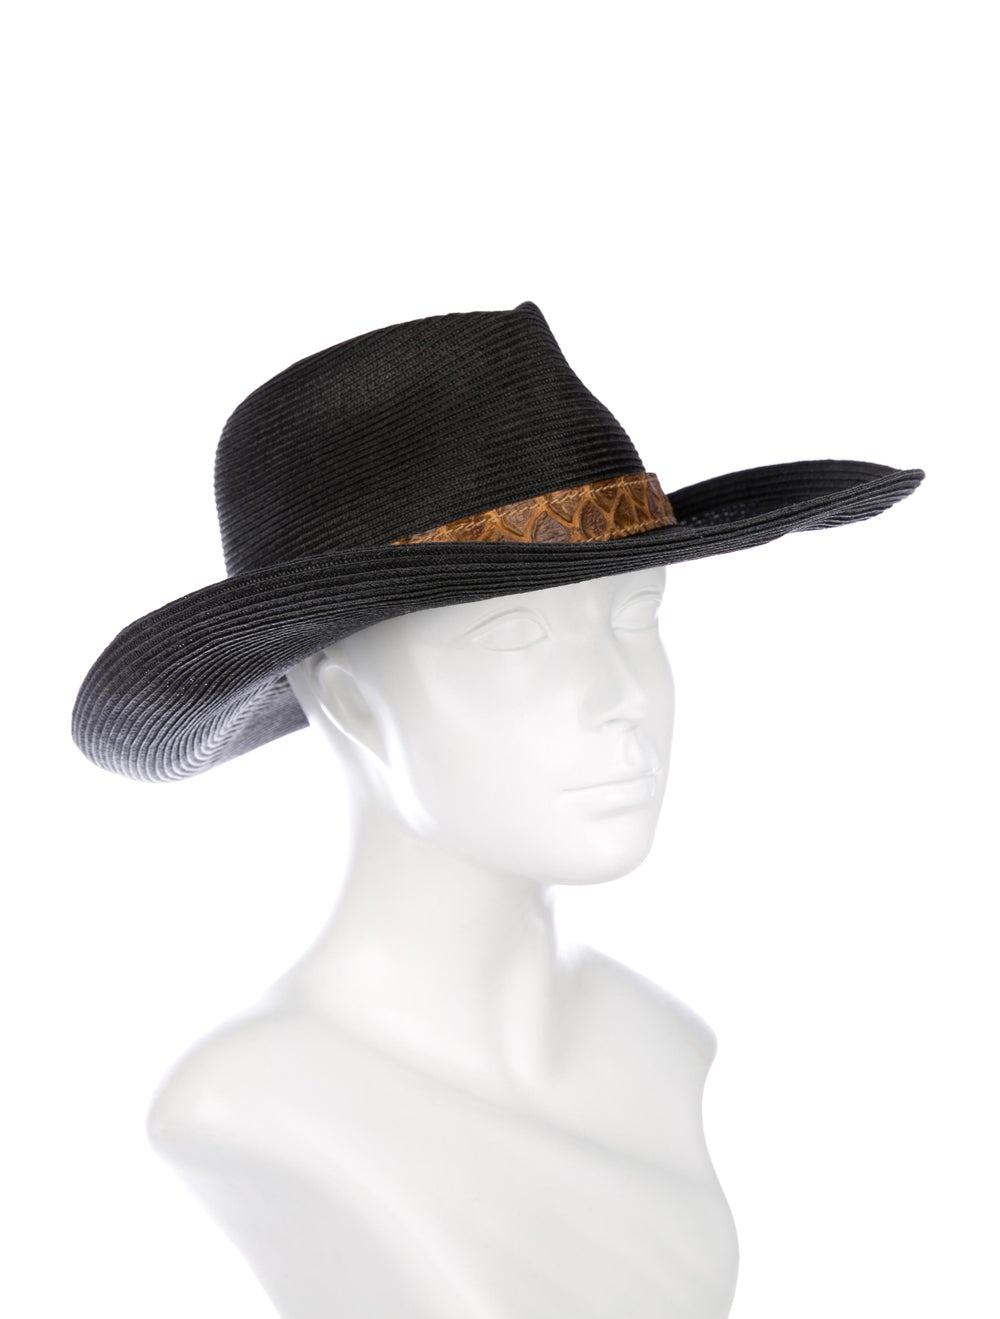 Eric Javits Straw Wide Brim Hat Black - image 3